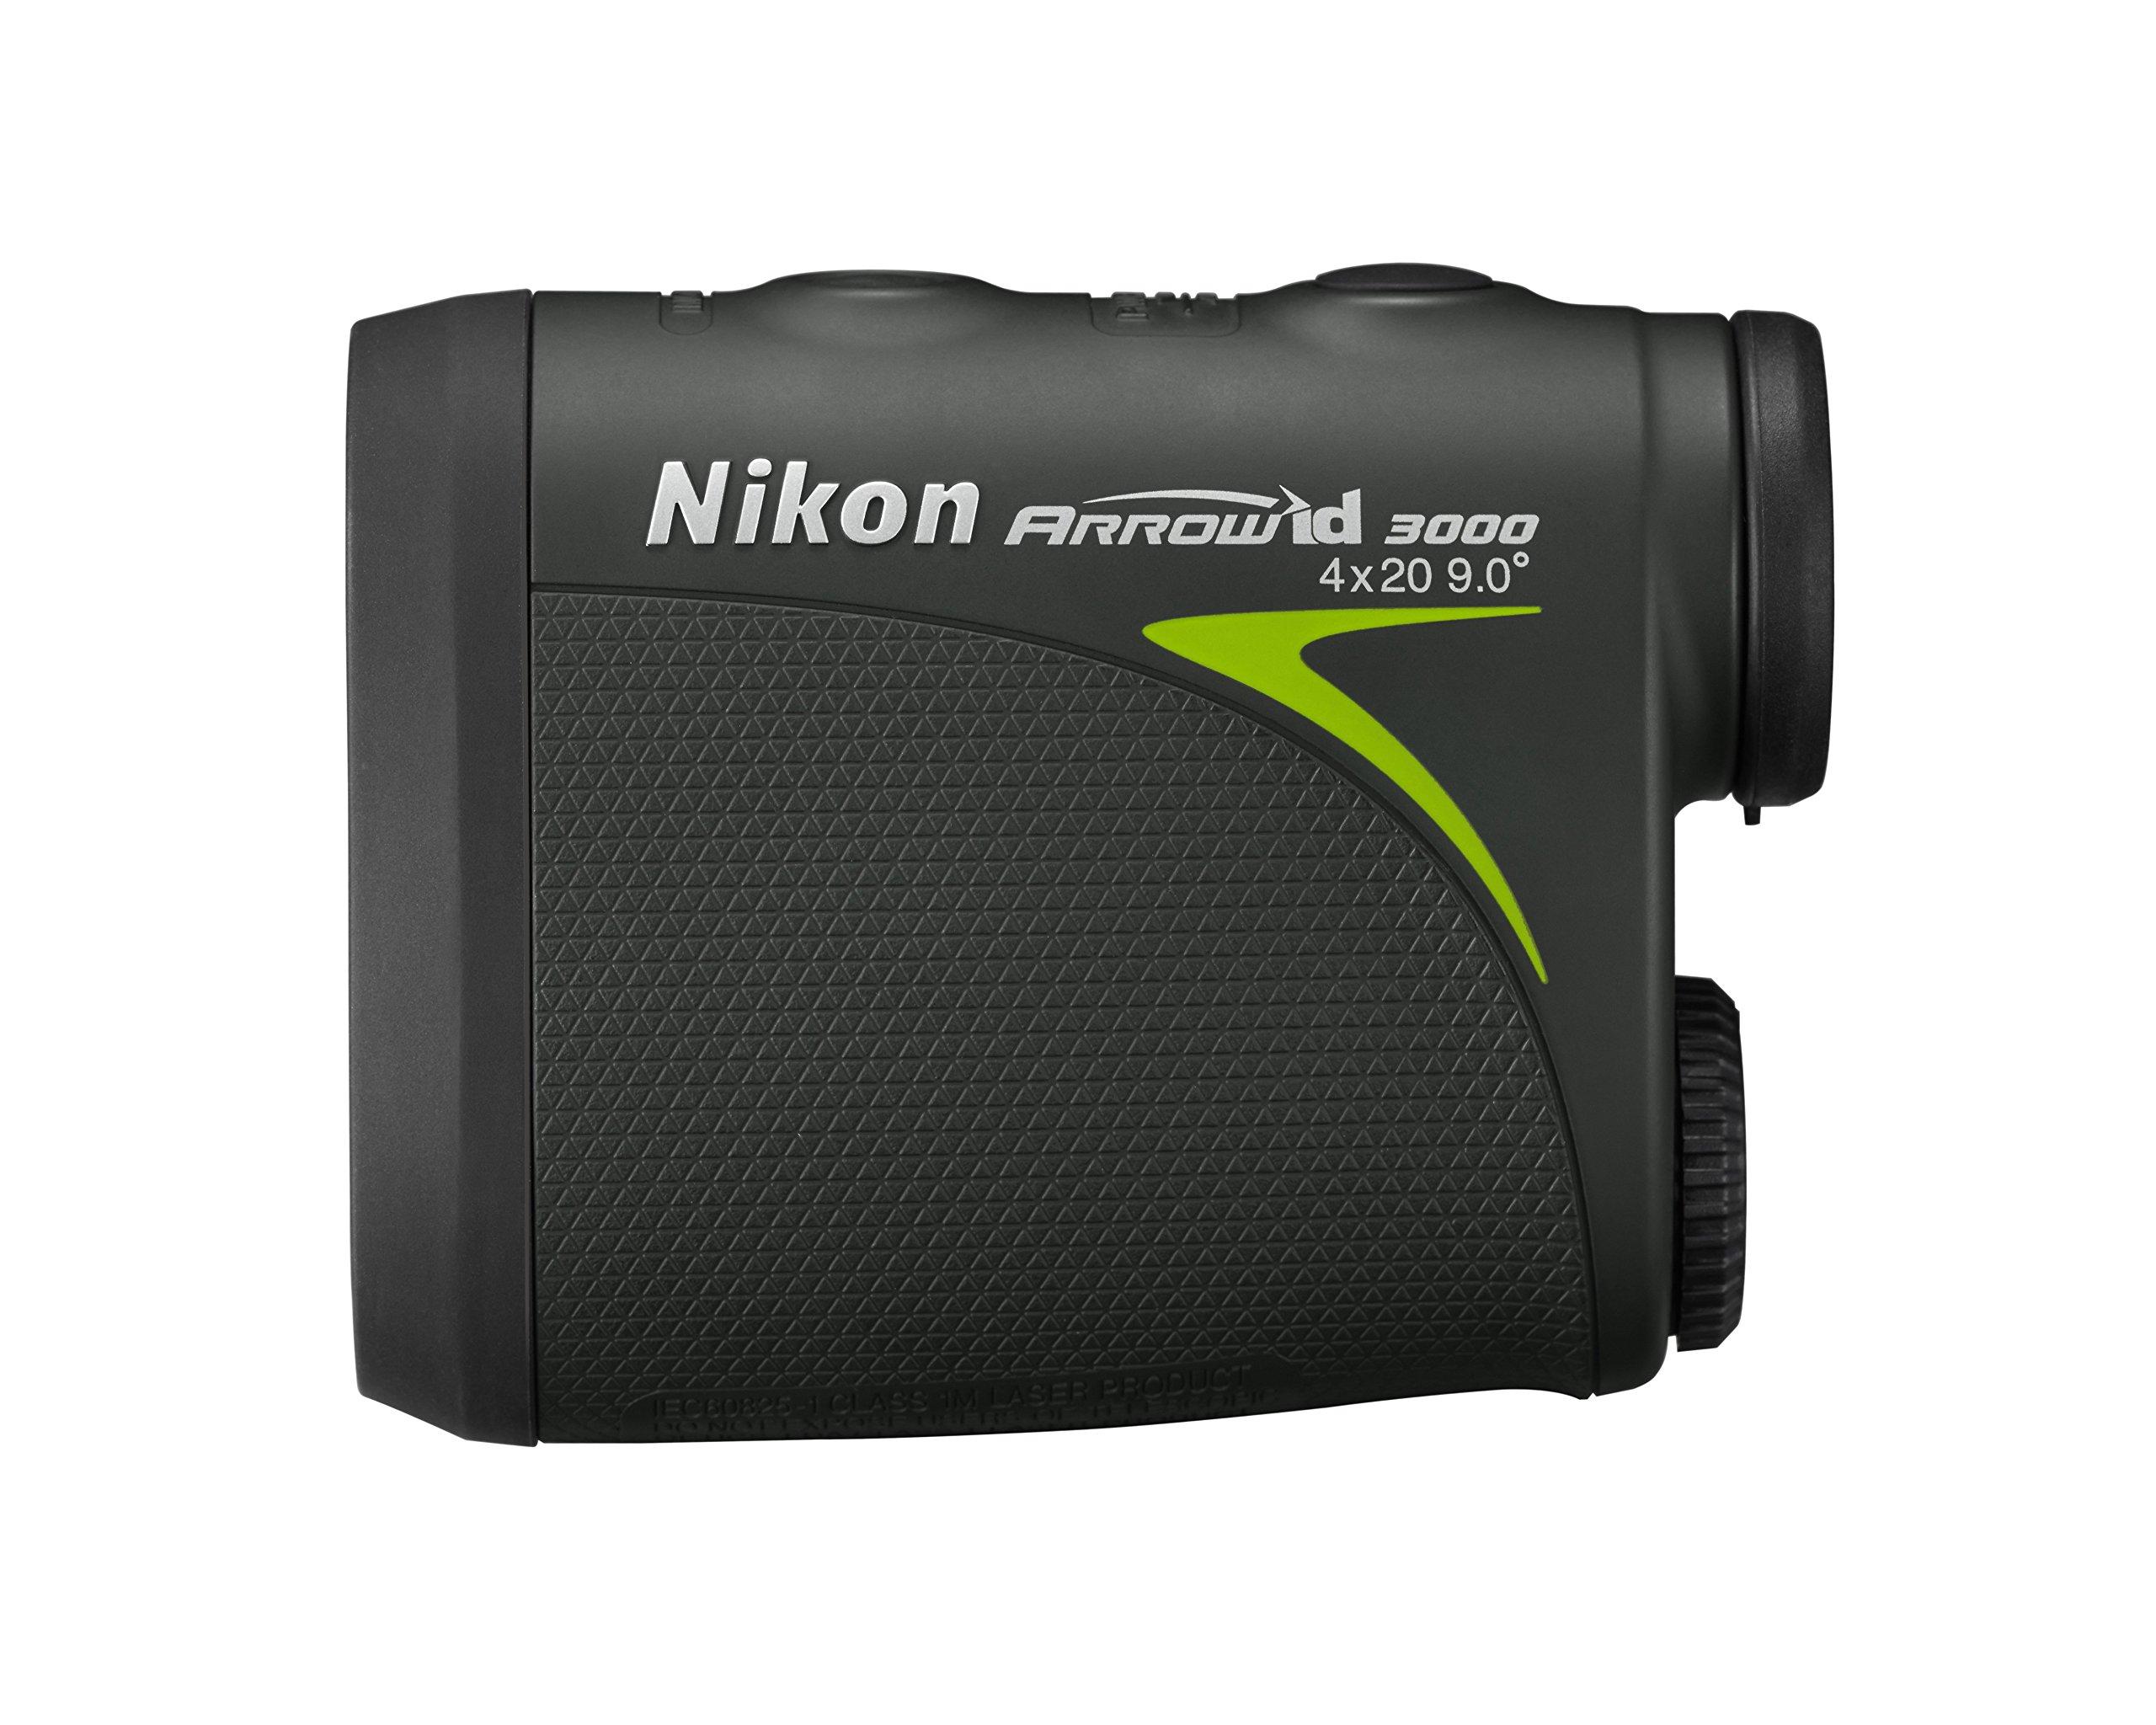 Nikon 16224 Arrow ID 3000 Bowhunting Laser Rangefinder by Nikon (Image #2)